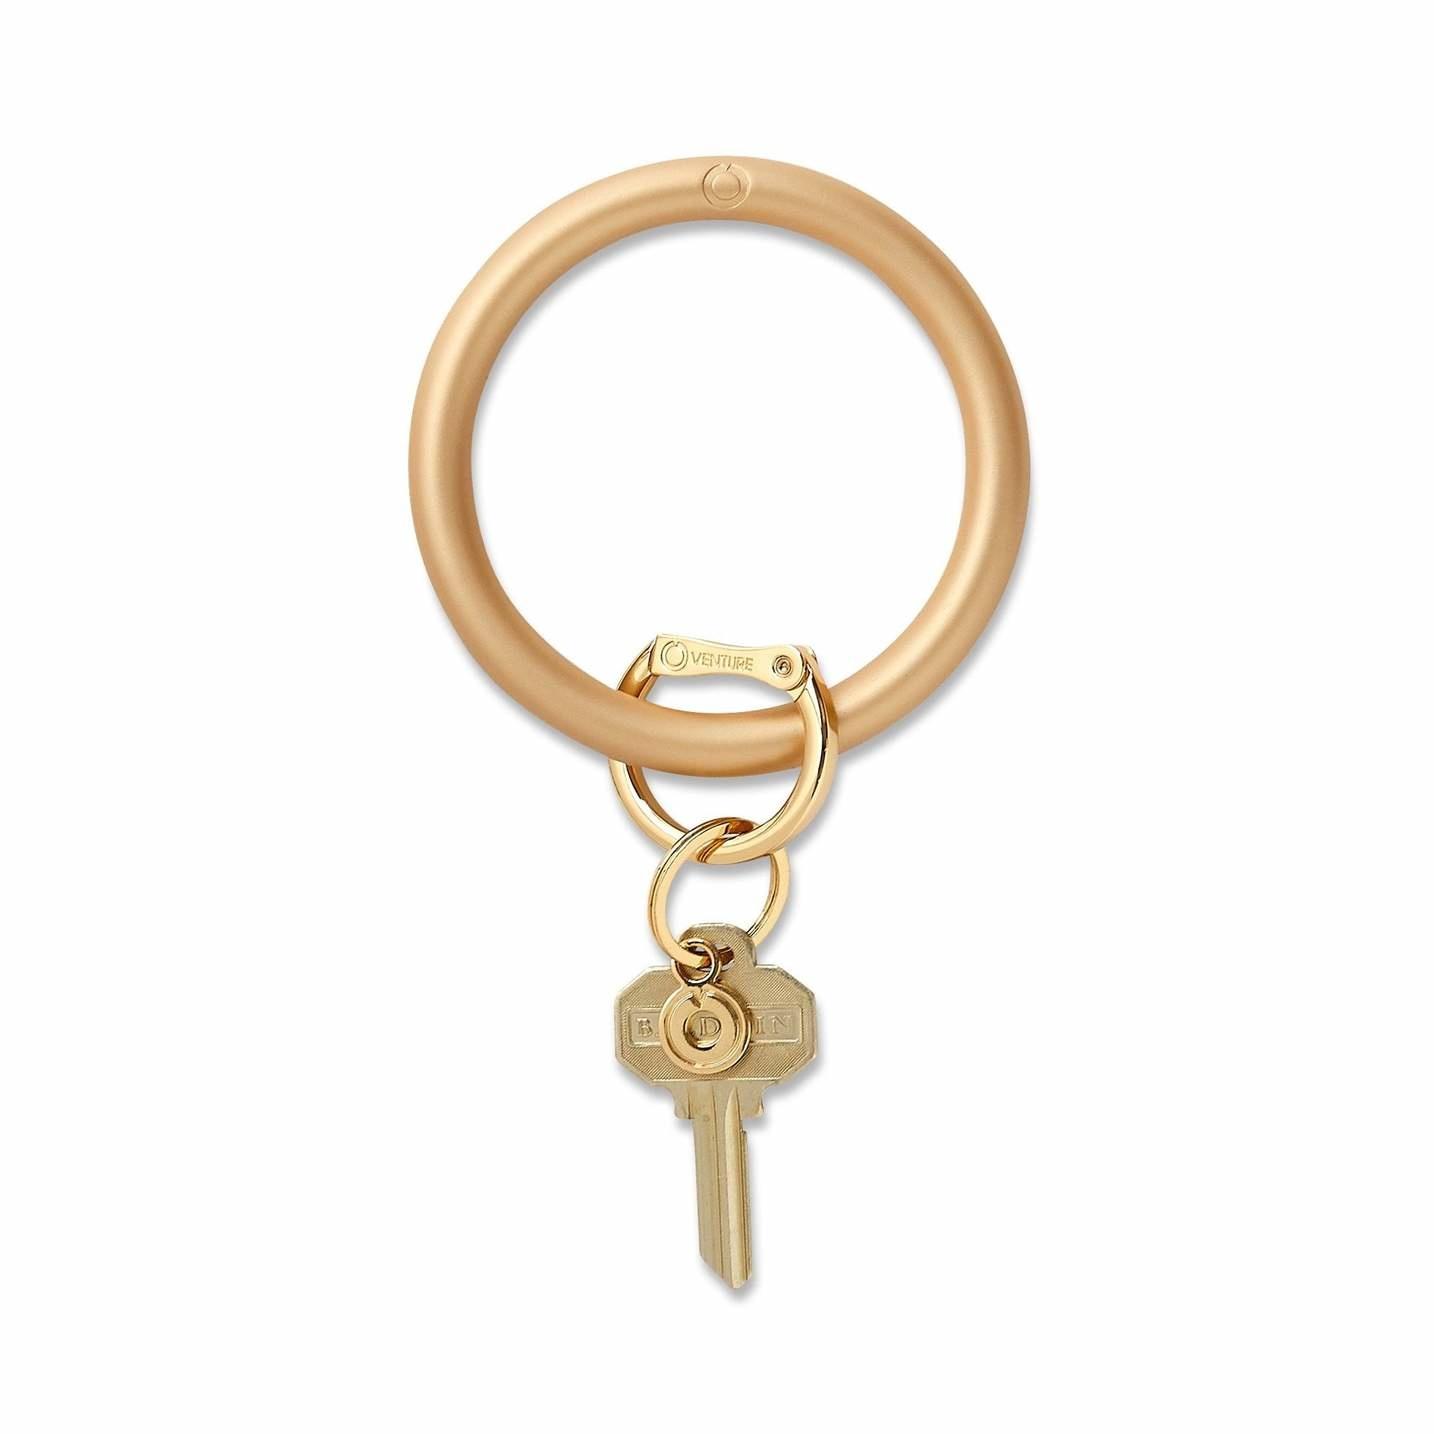 O venture Metallic Collection - Silicone Big O® Key Ring